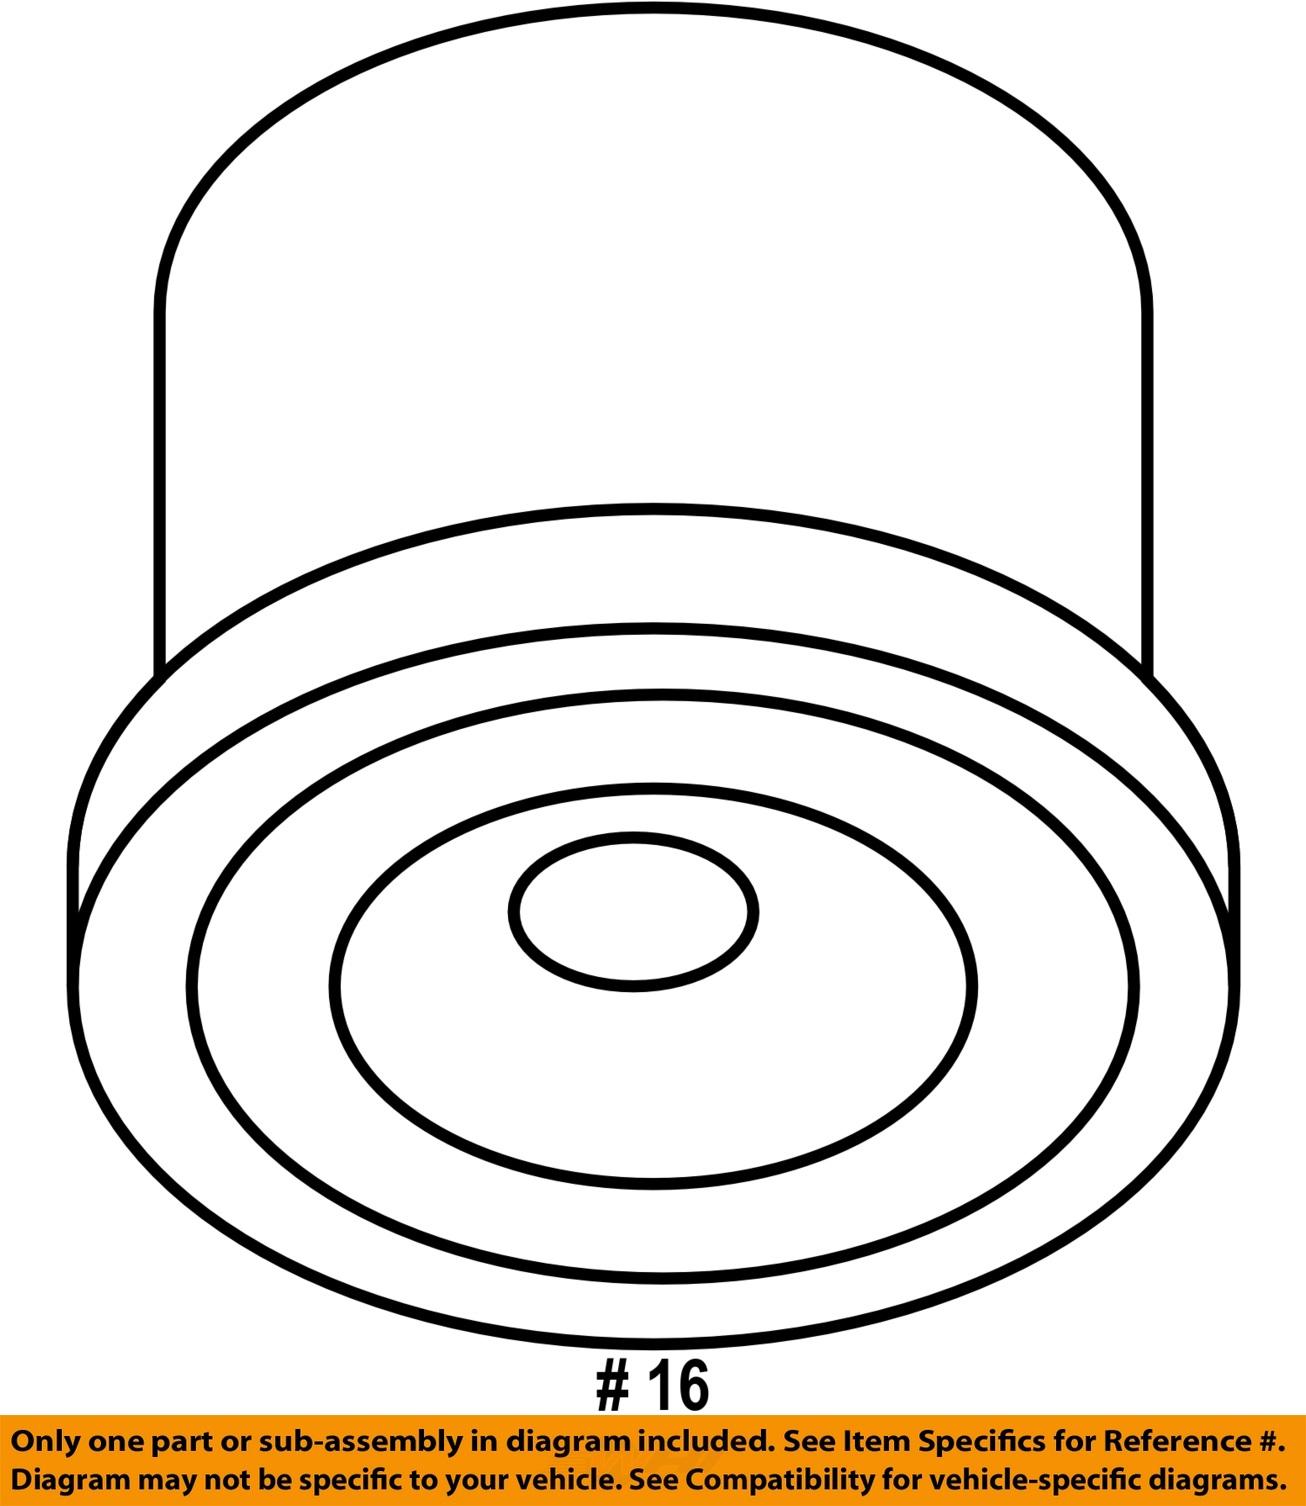 VW VOLKSWAGEN OEM 0910 Routan EngineOil Filter 7B0115561C – Routan Engine Diagram